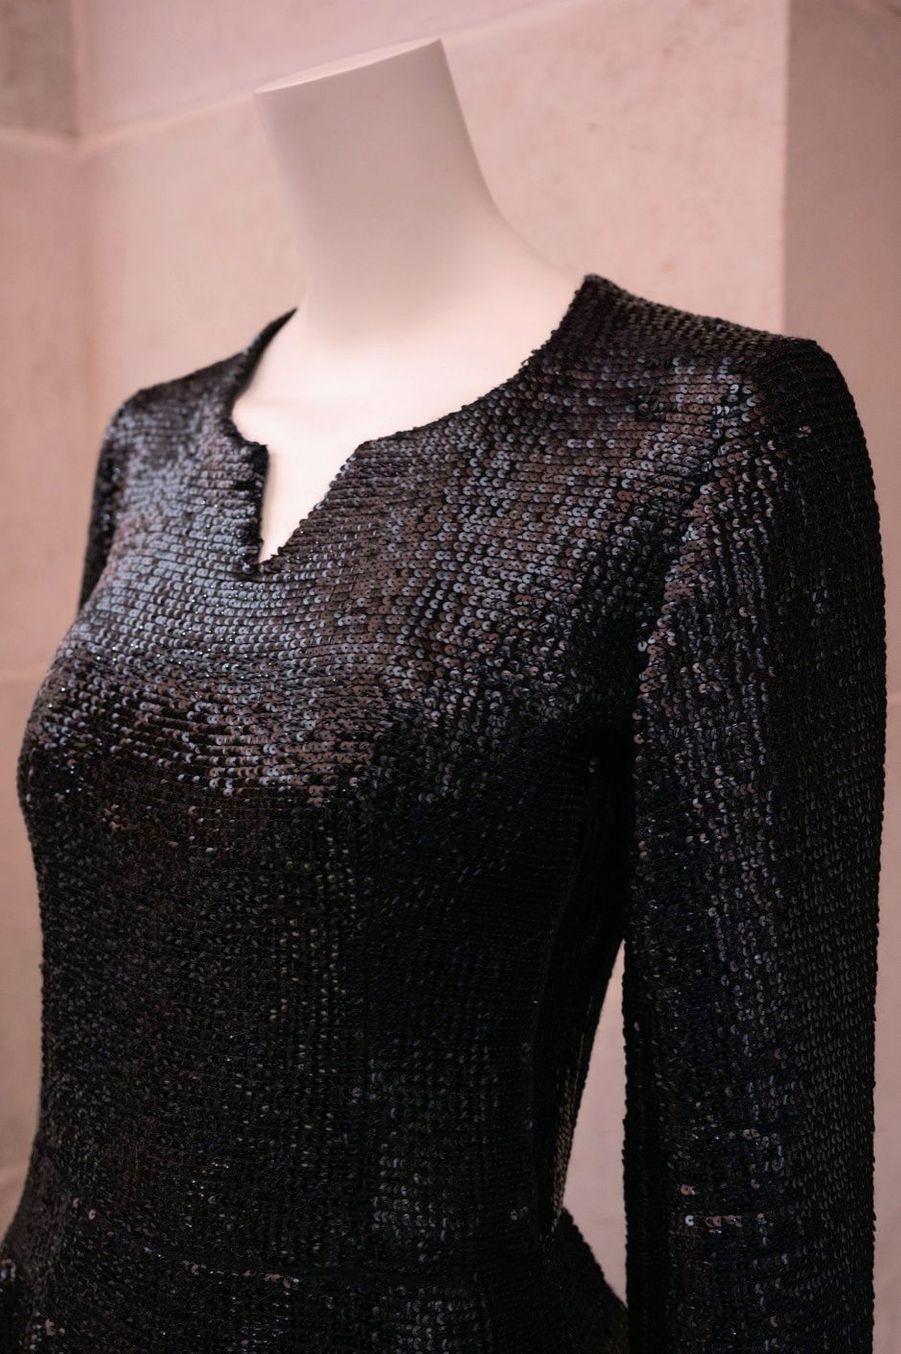 Robe brodée de sequins noirs ayant appartenu à Romy Schneider